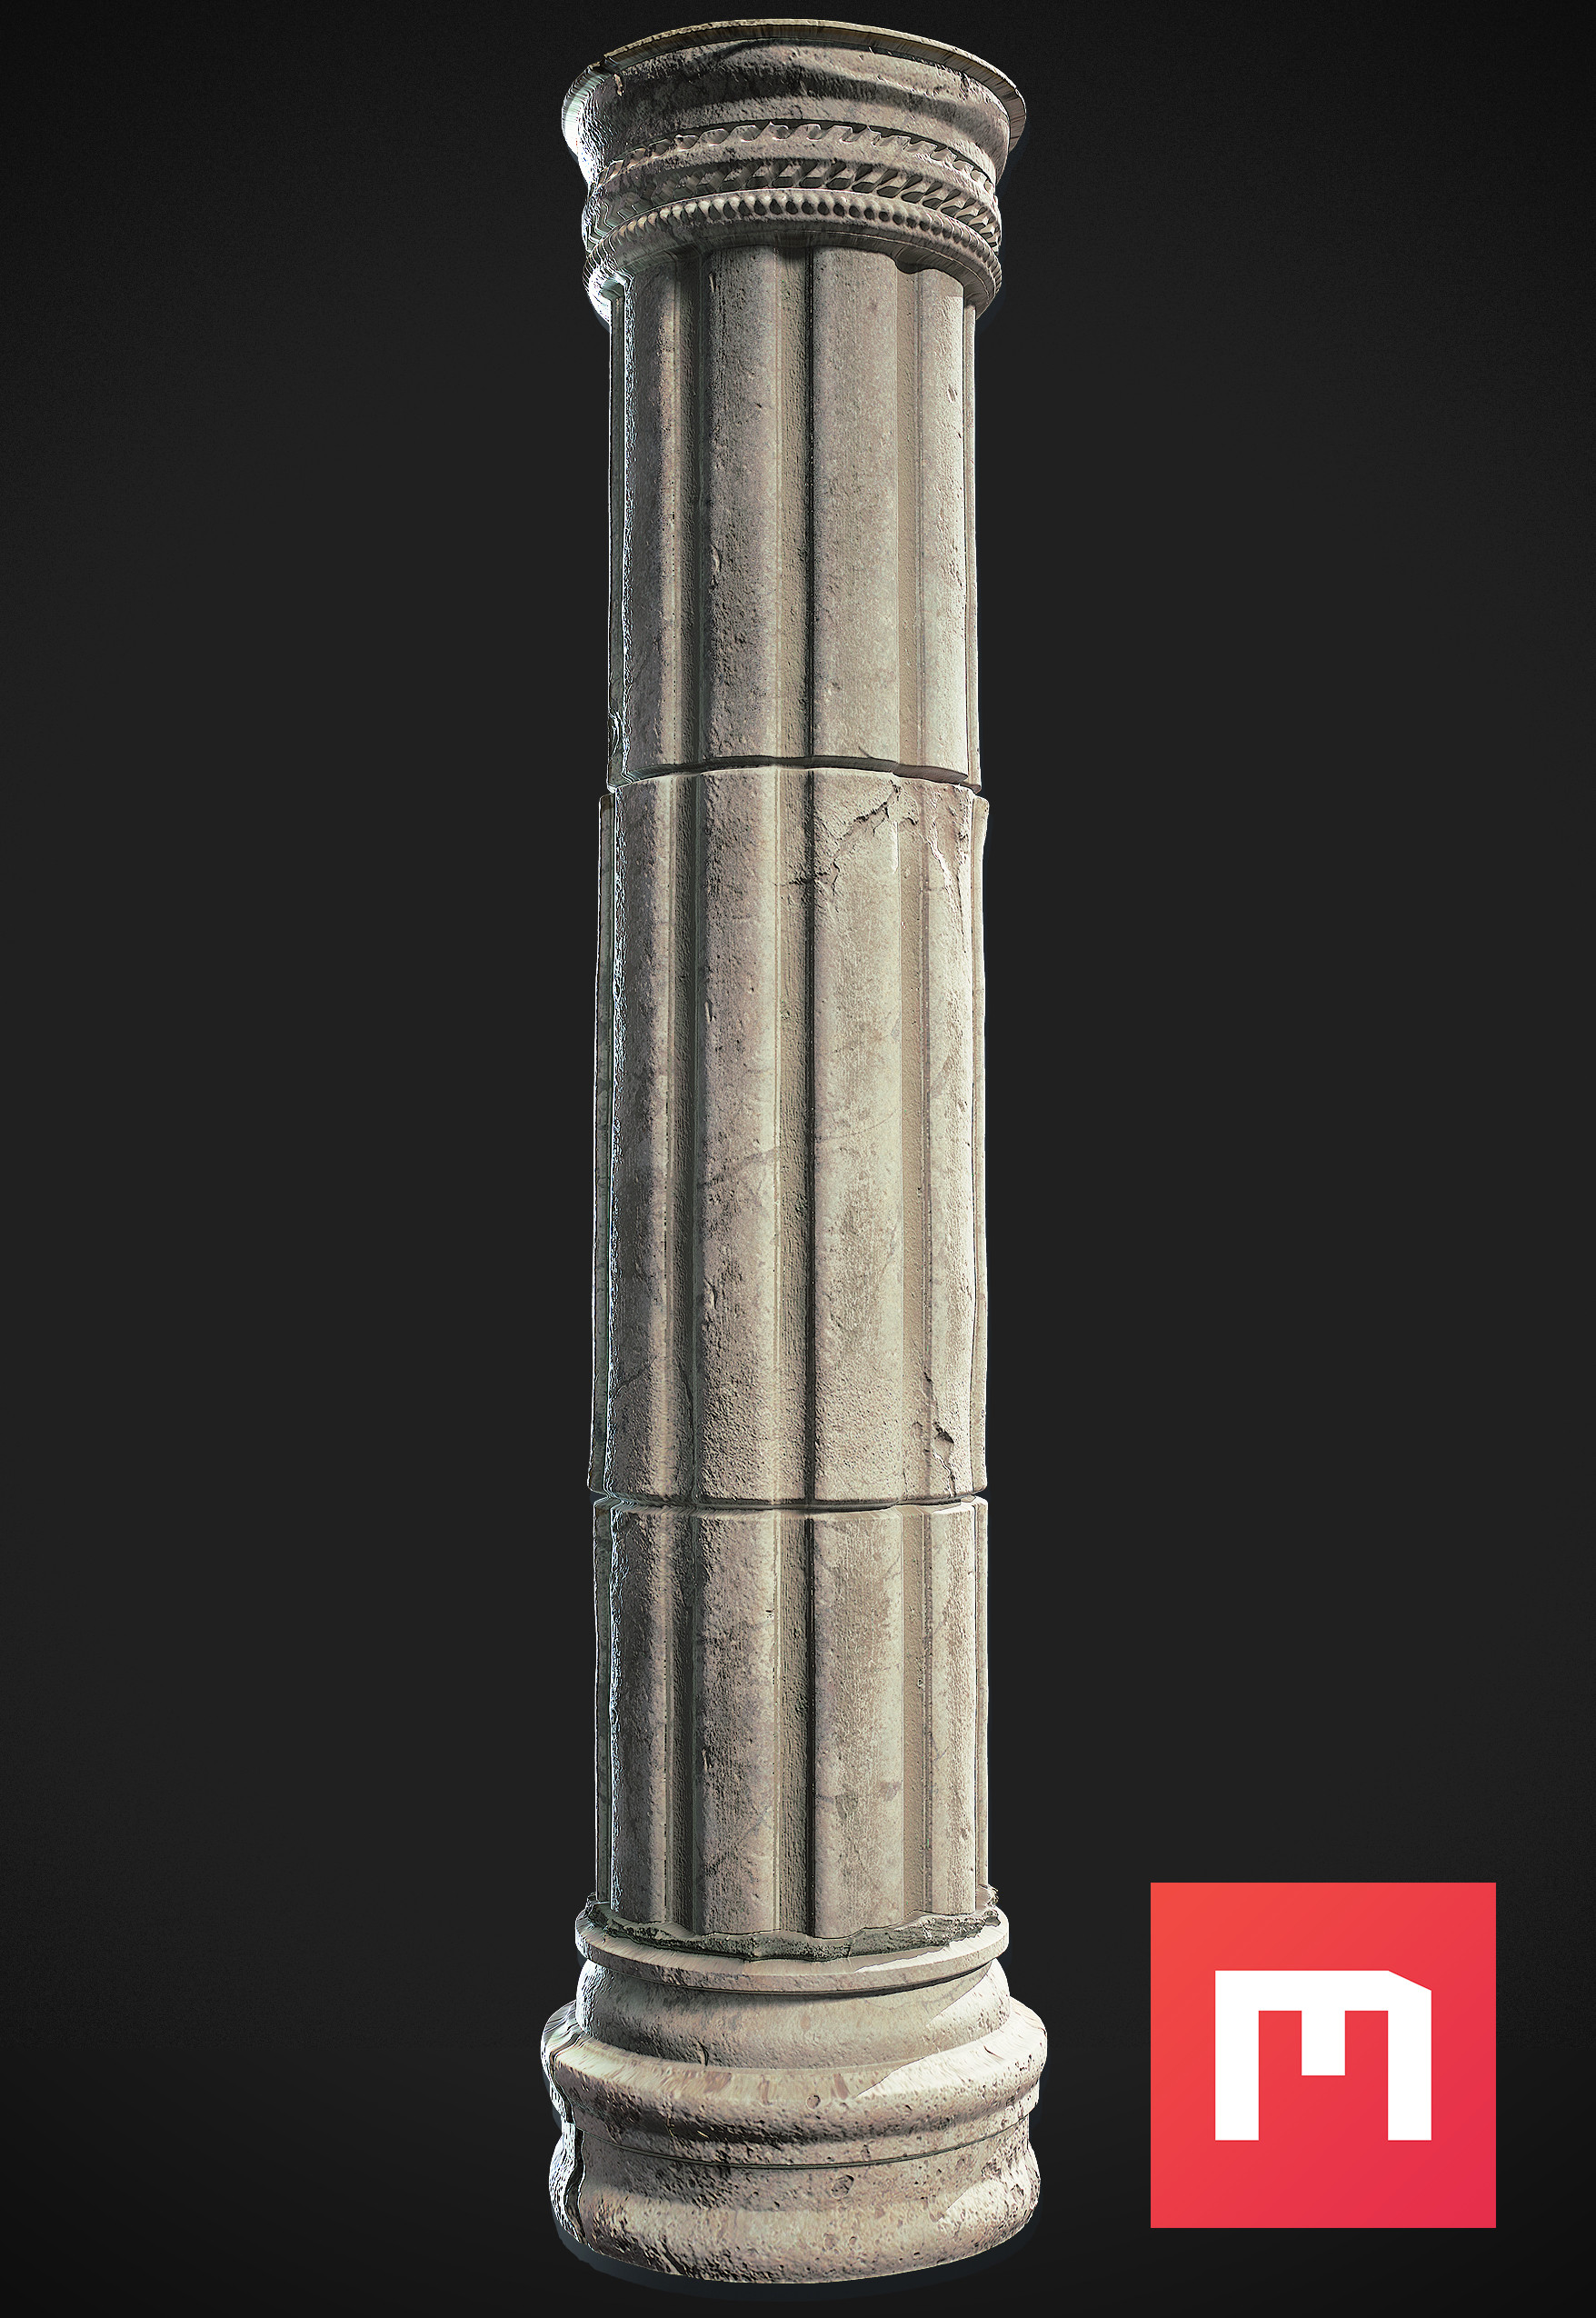 Wiktor ohman ancient pillar 2